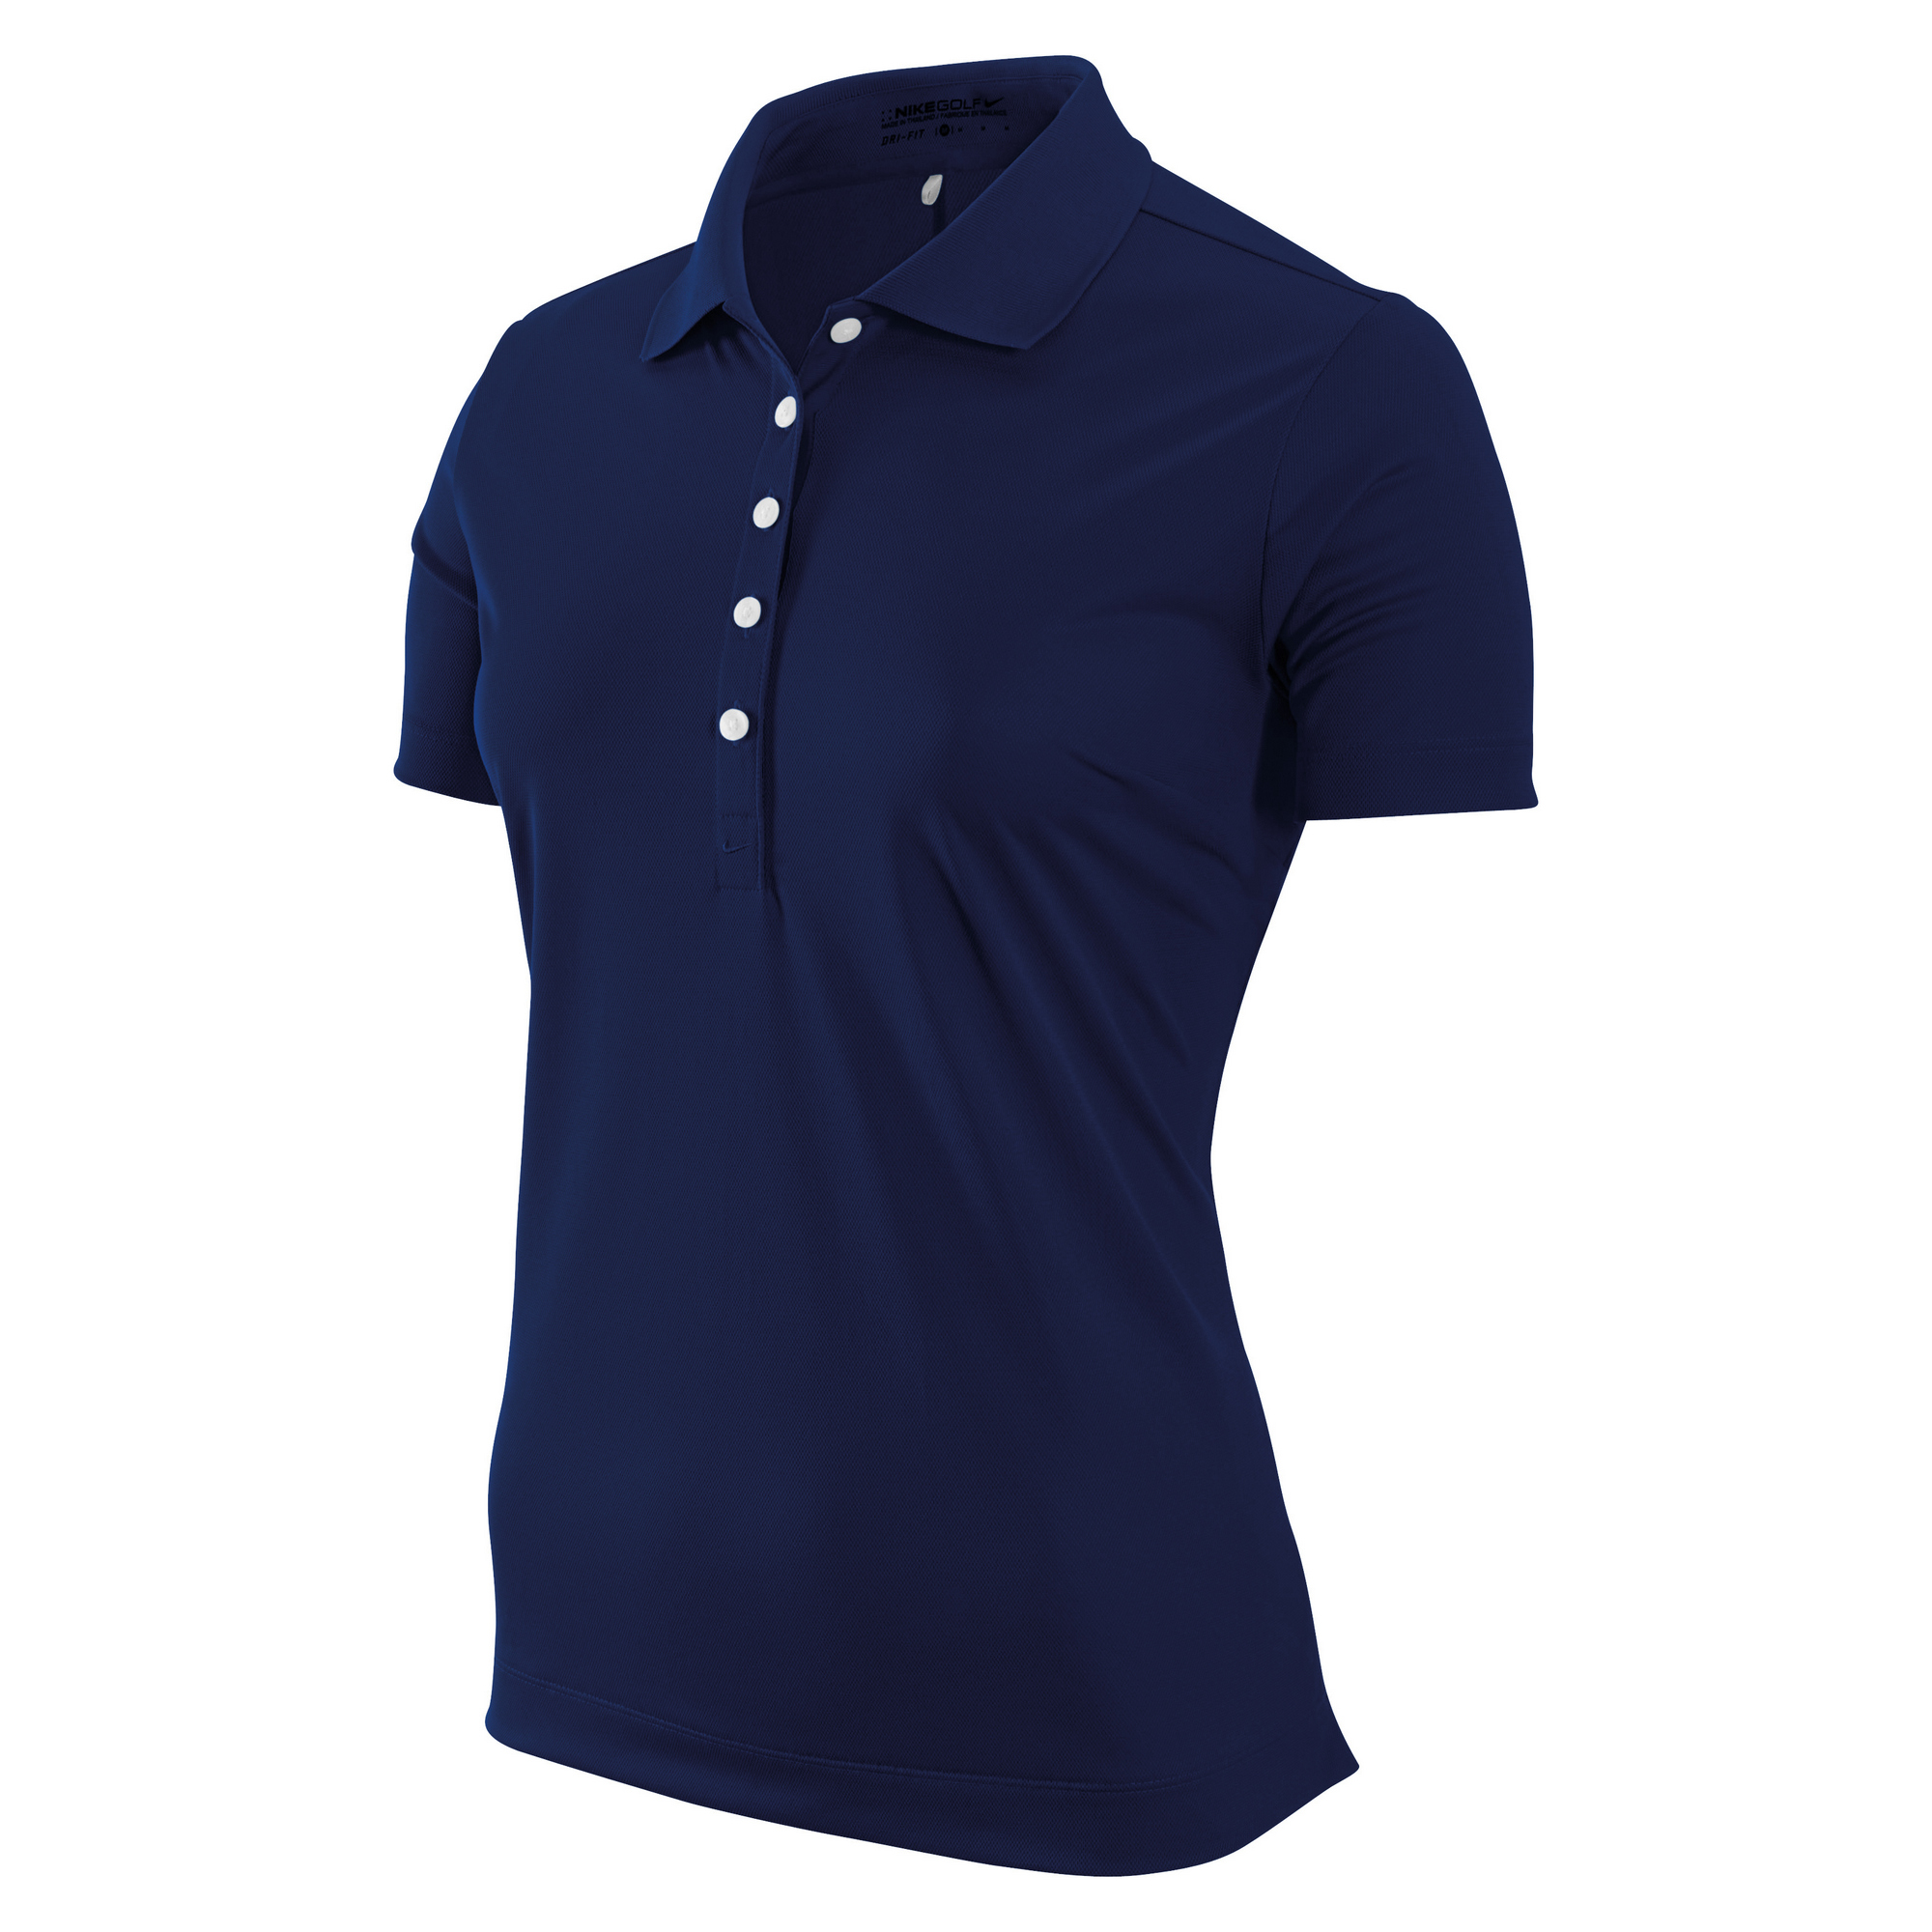 Nike Womens/Ladies Victory Sports Polo Shirt top